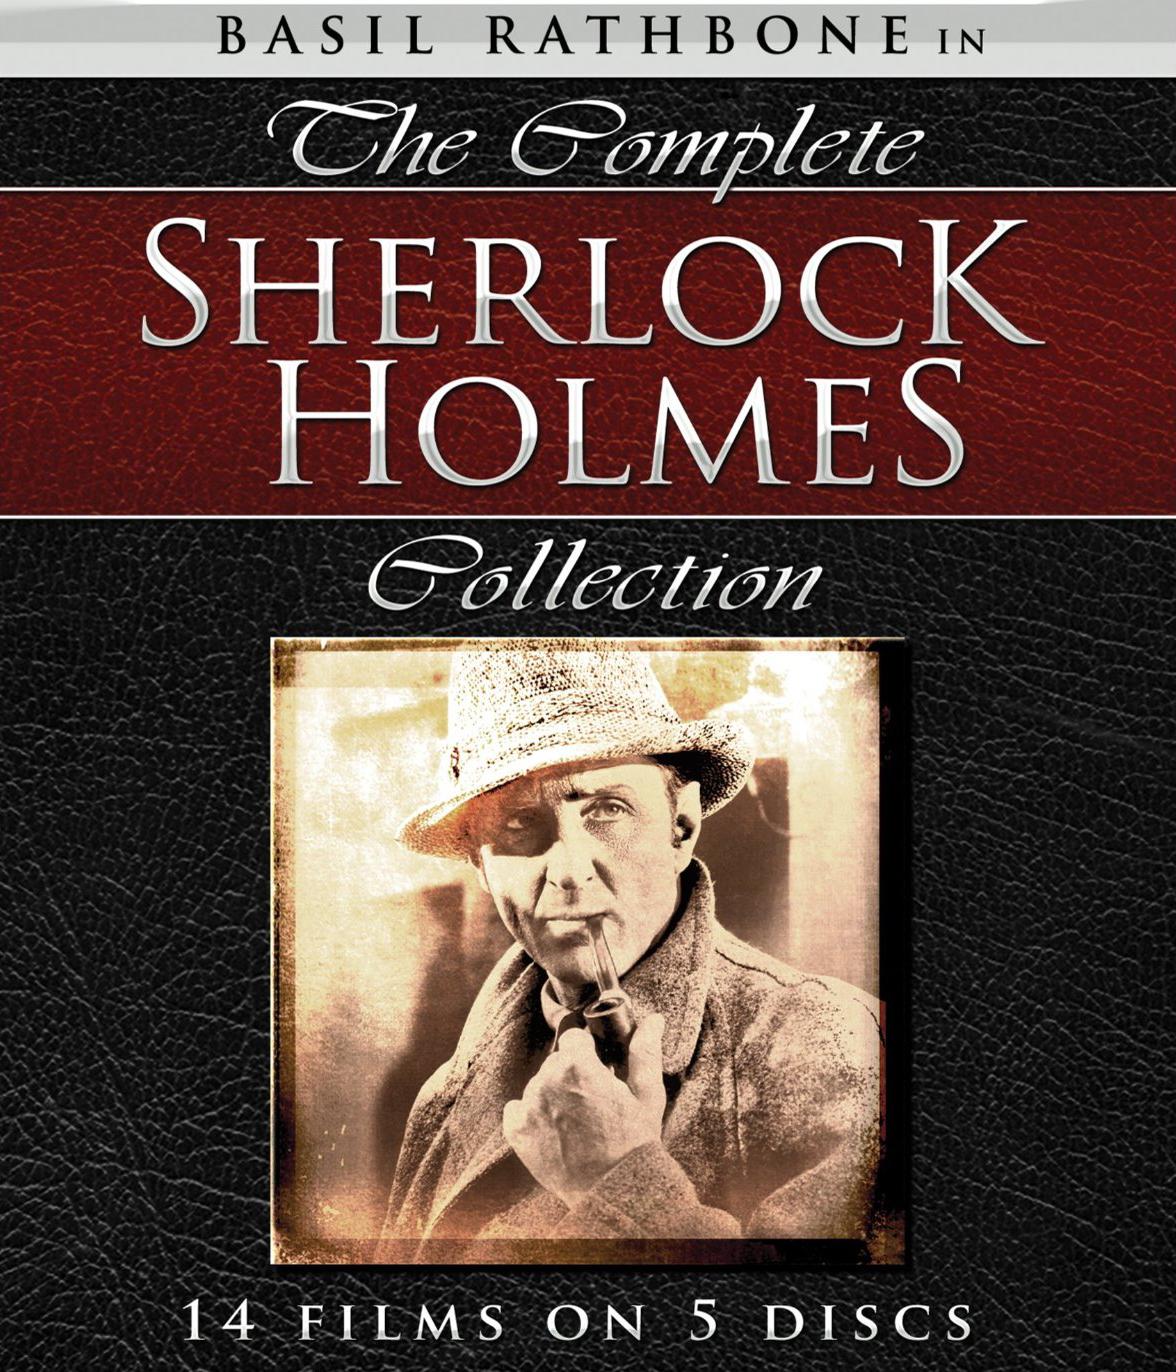 Шерлок Холмс: Полная коллекция (1939-1946) - Sherlock Holmes- The Complete Collection